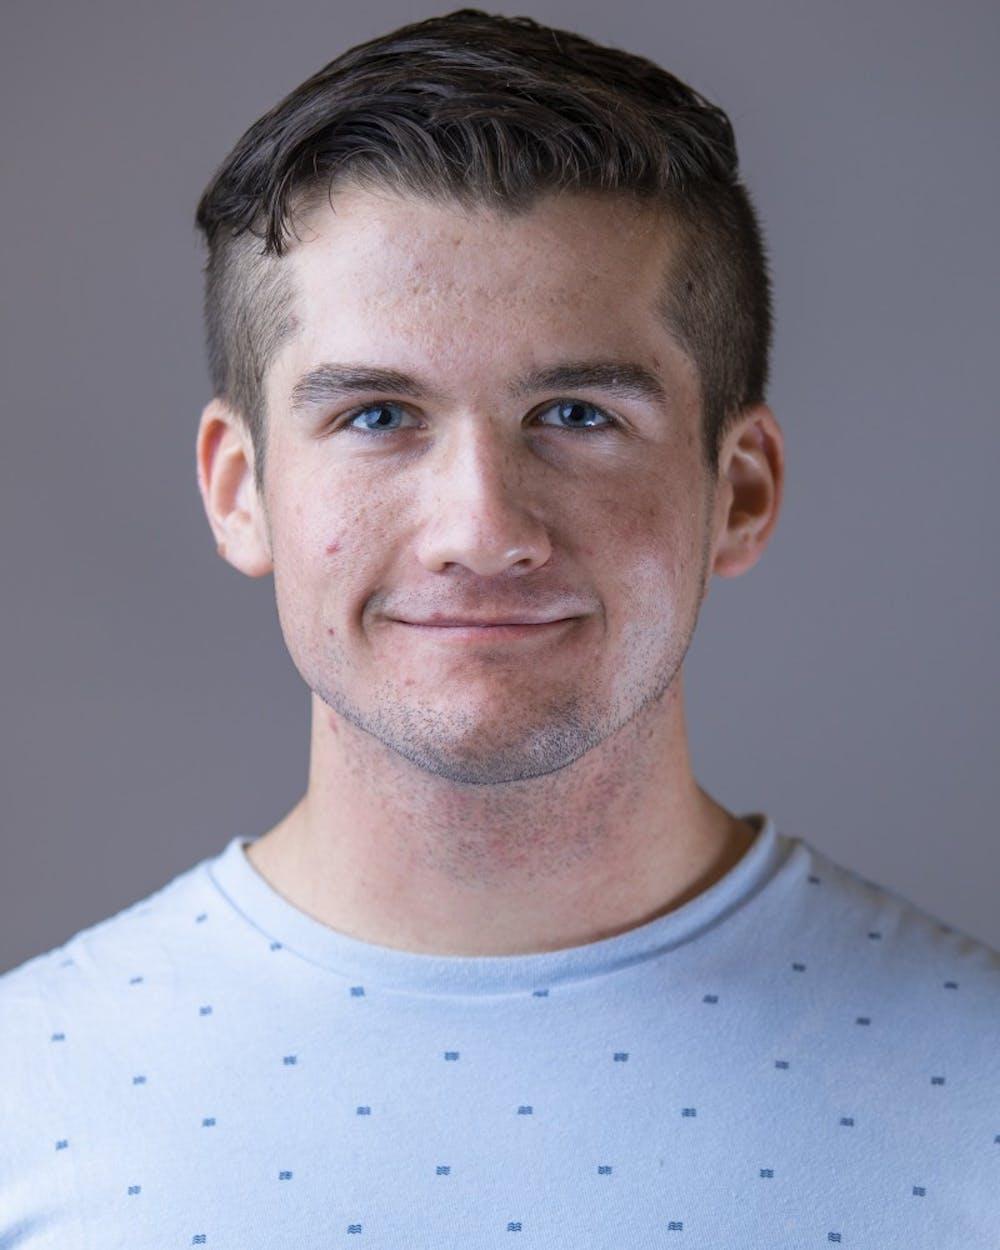 Tyler Larkworthy | Greek life promotes harmful ideas about gender